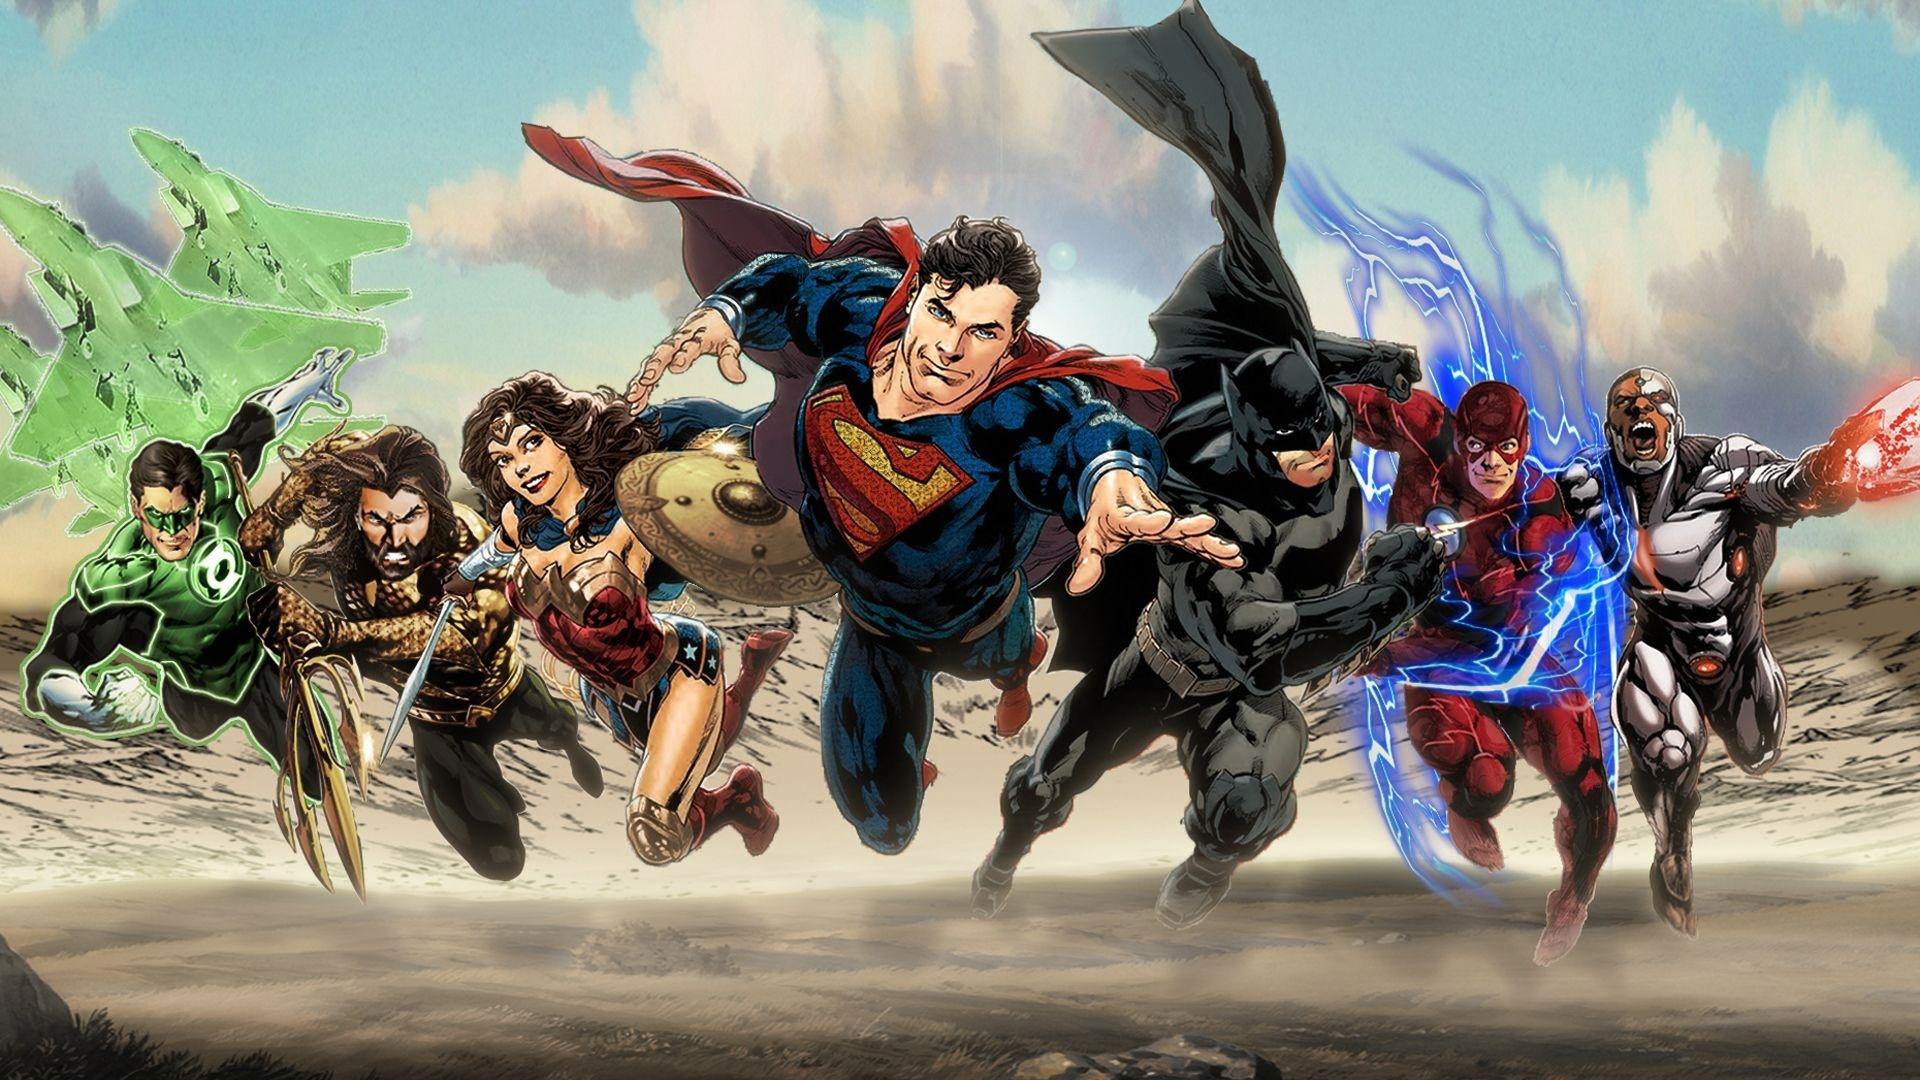 Justice League best background